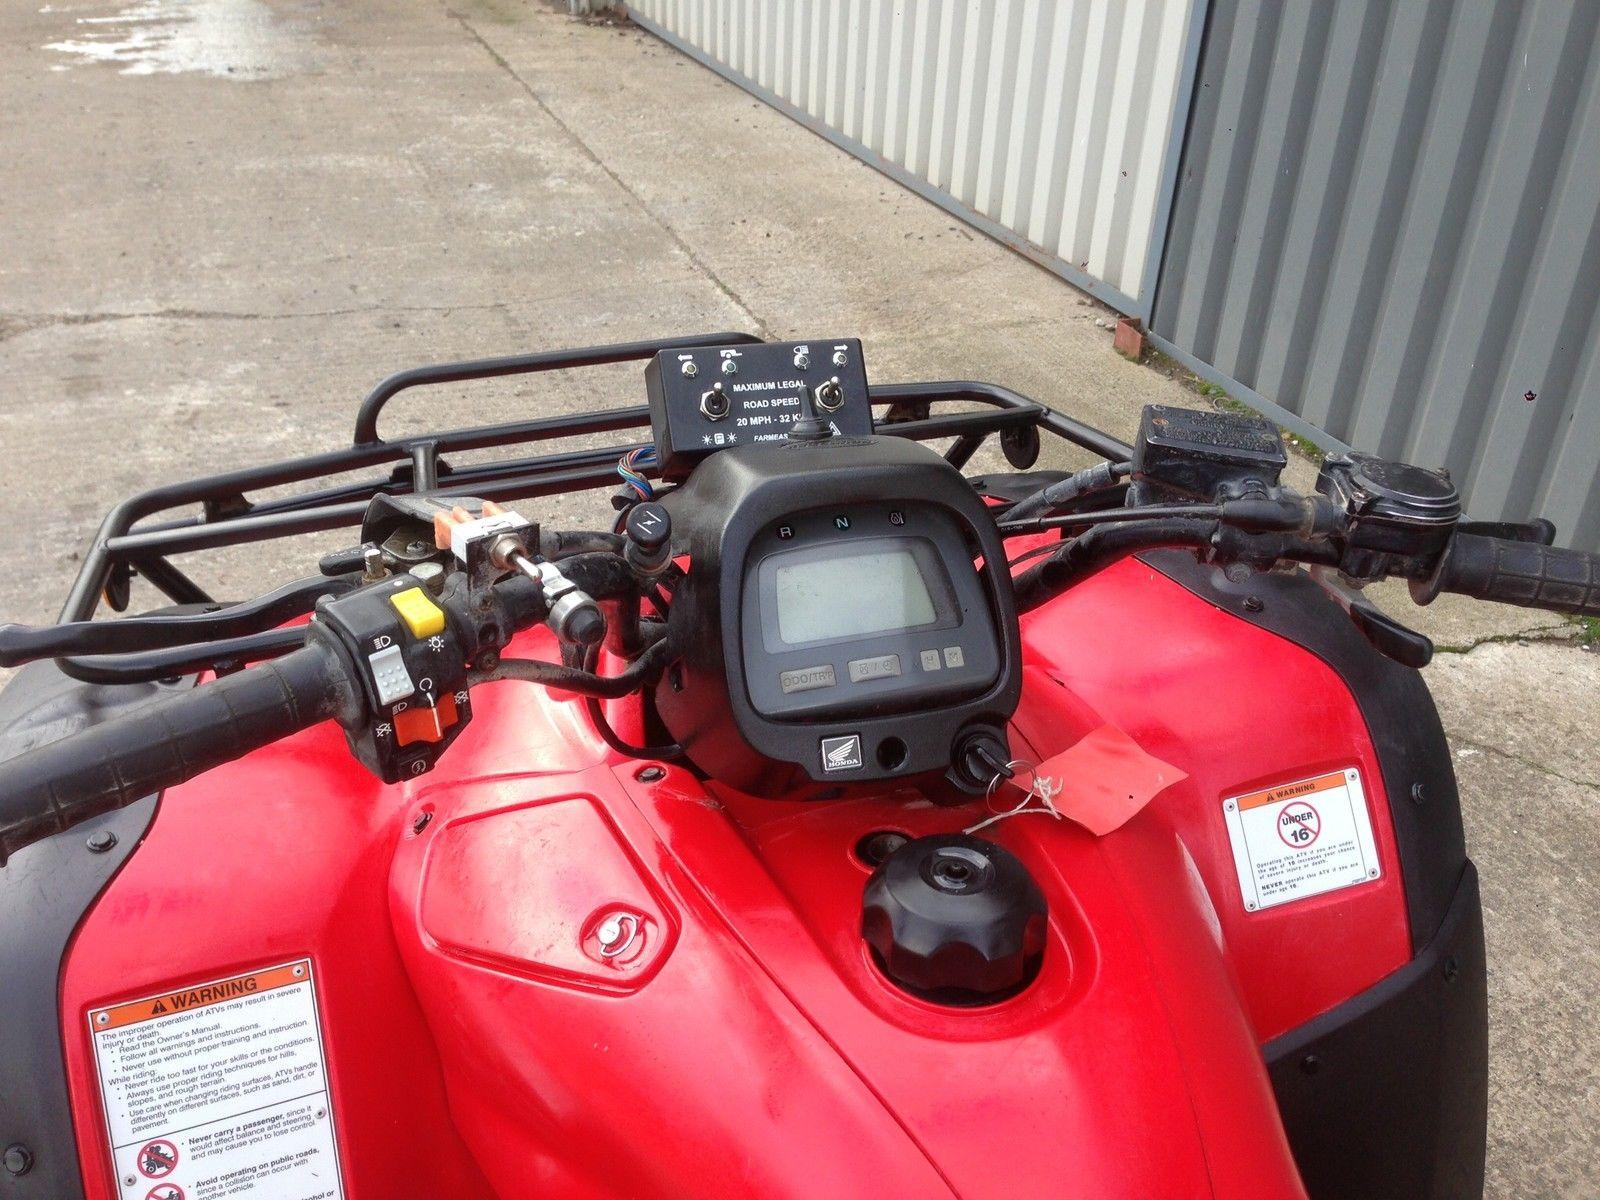 Honda Trx 350 4x4 Fully Road Legal Quad Foreman Trx 500 420 Grizzly 450